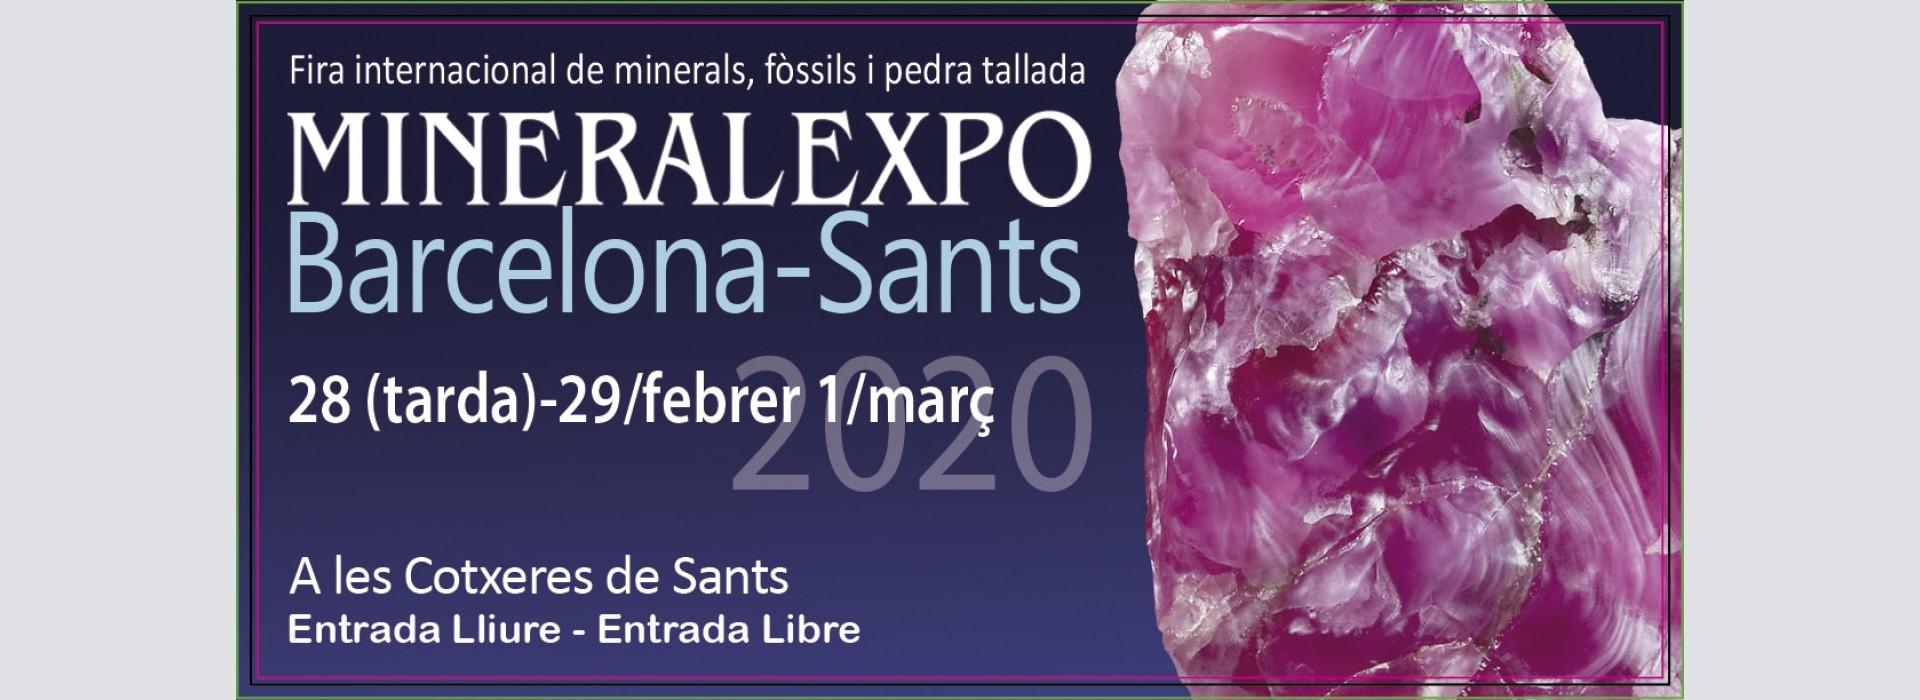 MineralExpo Barcelona-Sants 2020